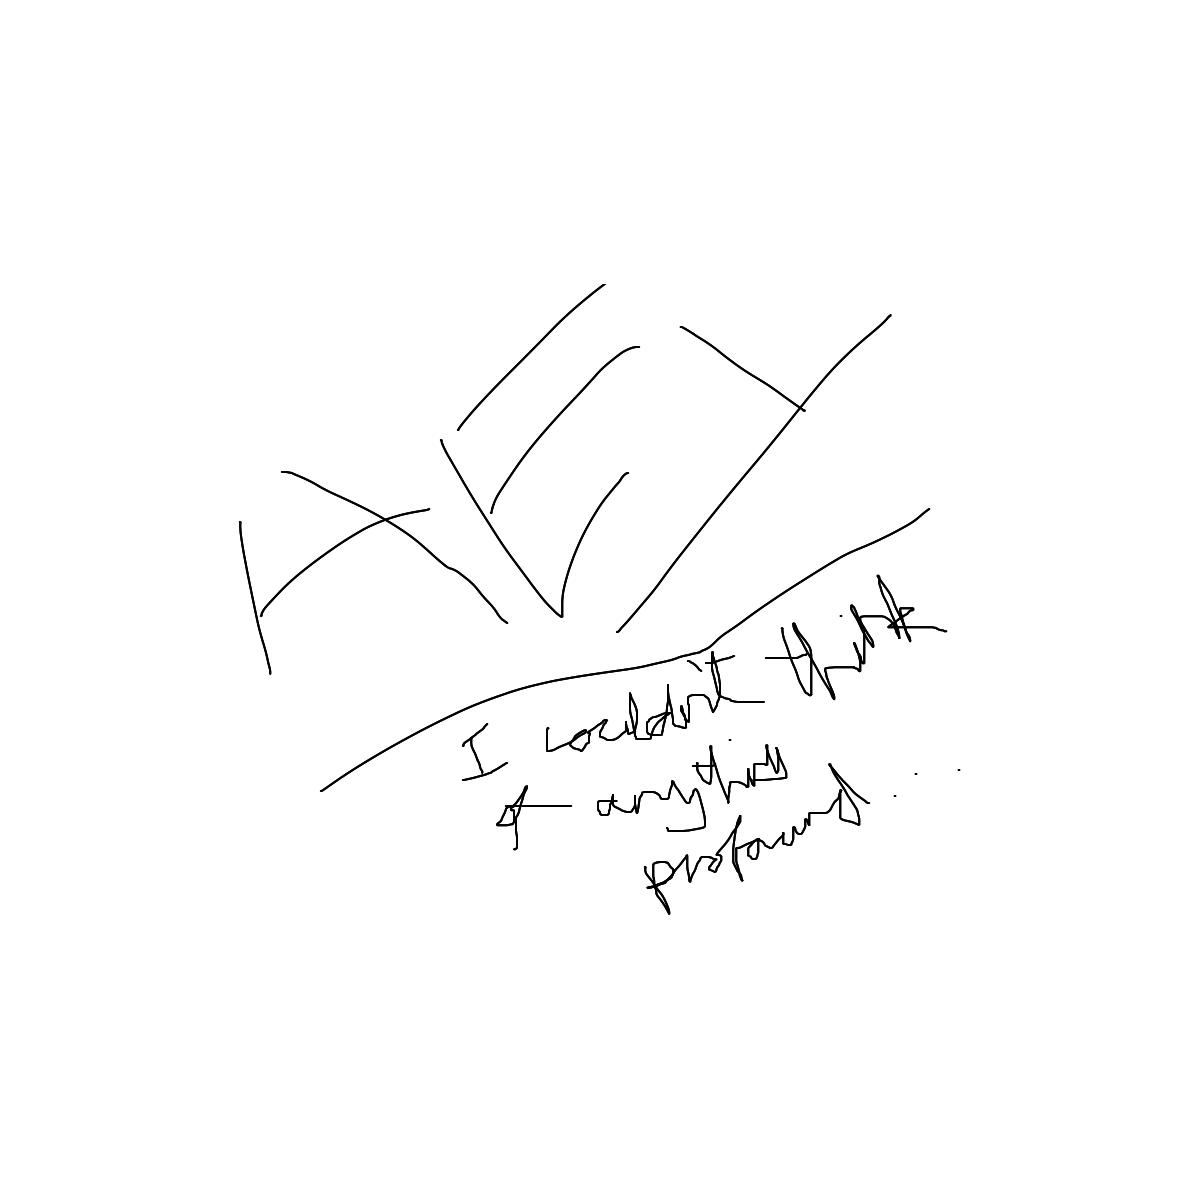 BAAAM drawing#256 lat:51.4799270629882800lng: -2.6237475872039795